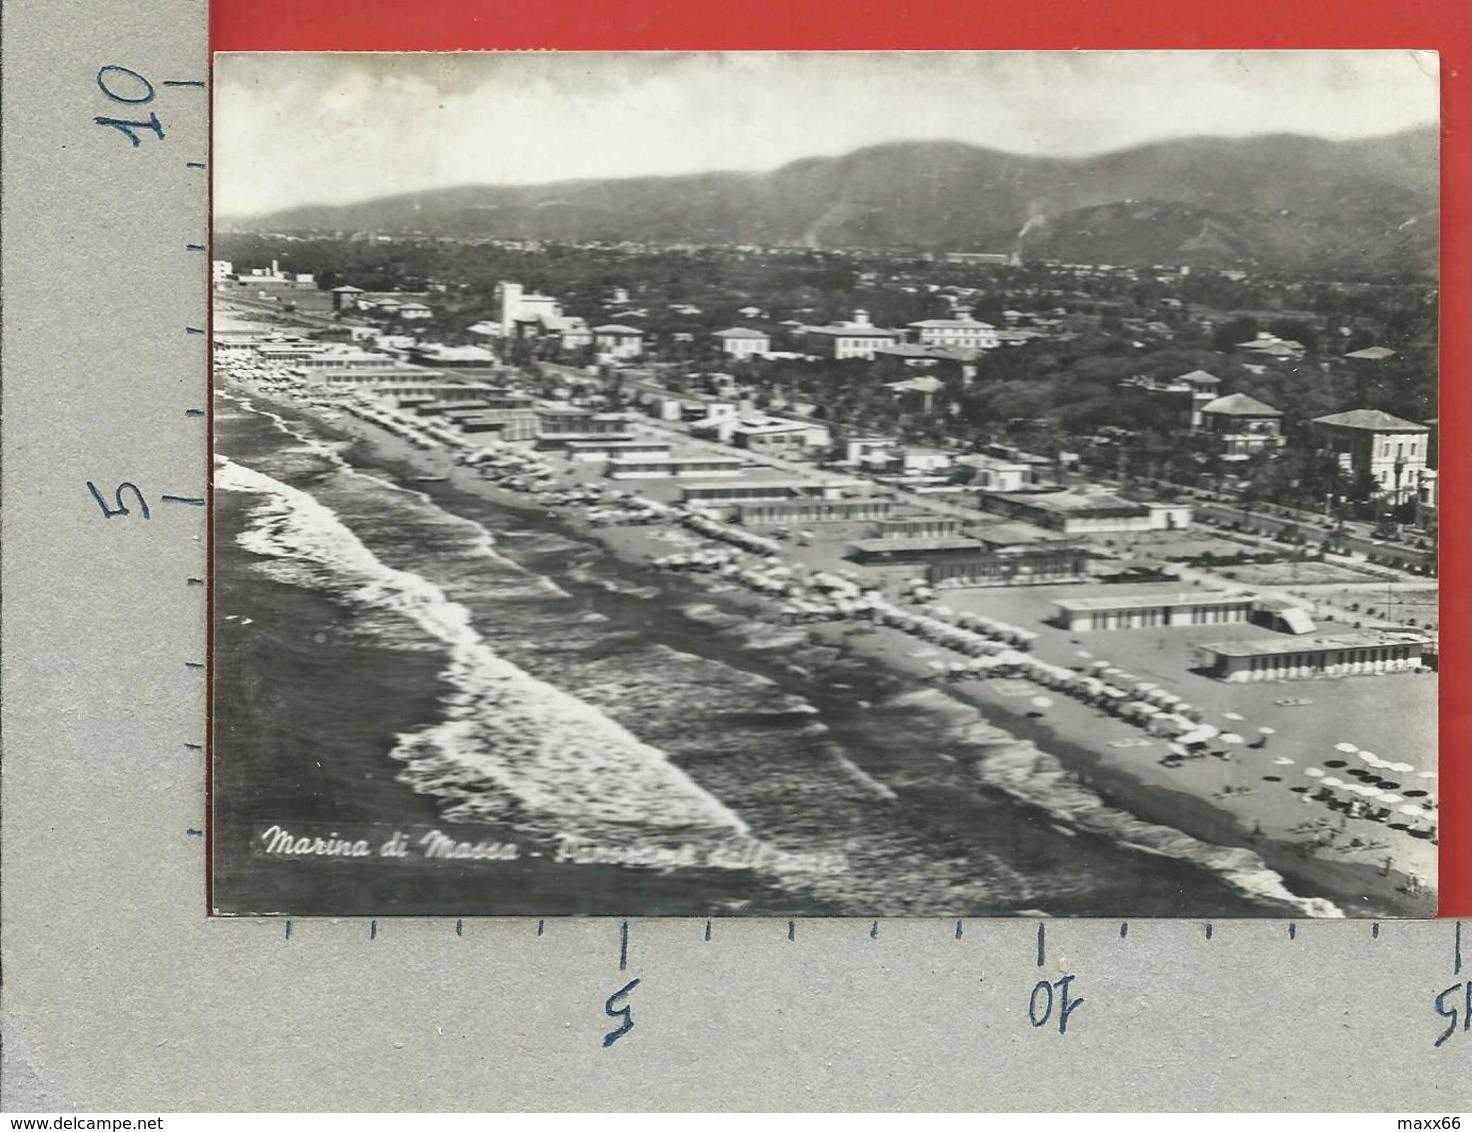 CARTOLINA VG ITALIA - MARINA DI MASSA (MC) - Panorama Dall'aereo - 10 X 15 - ANN. 1956 - Massa